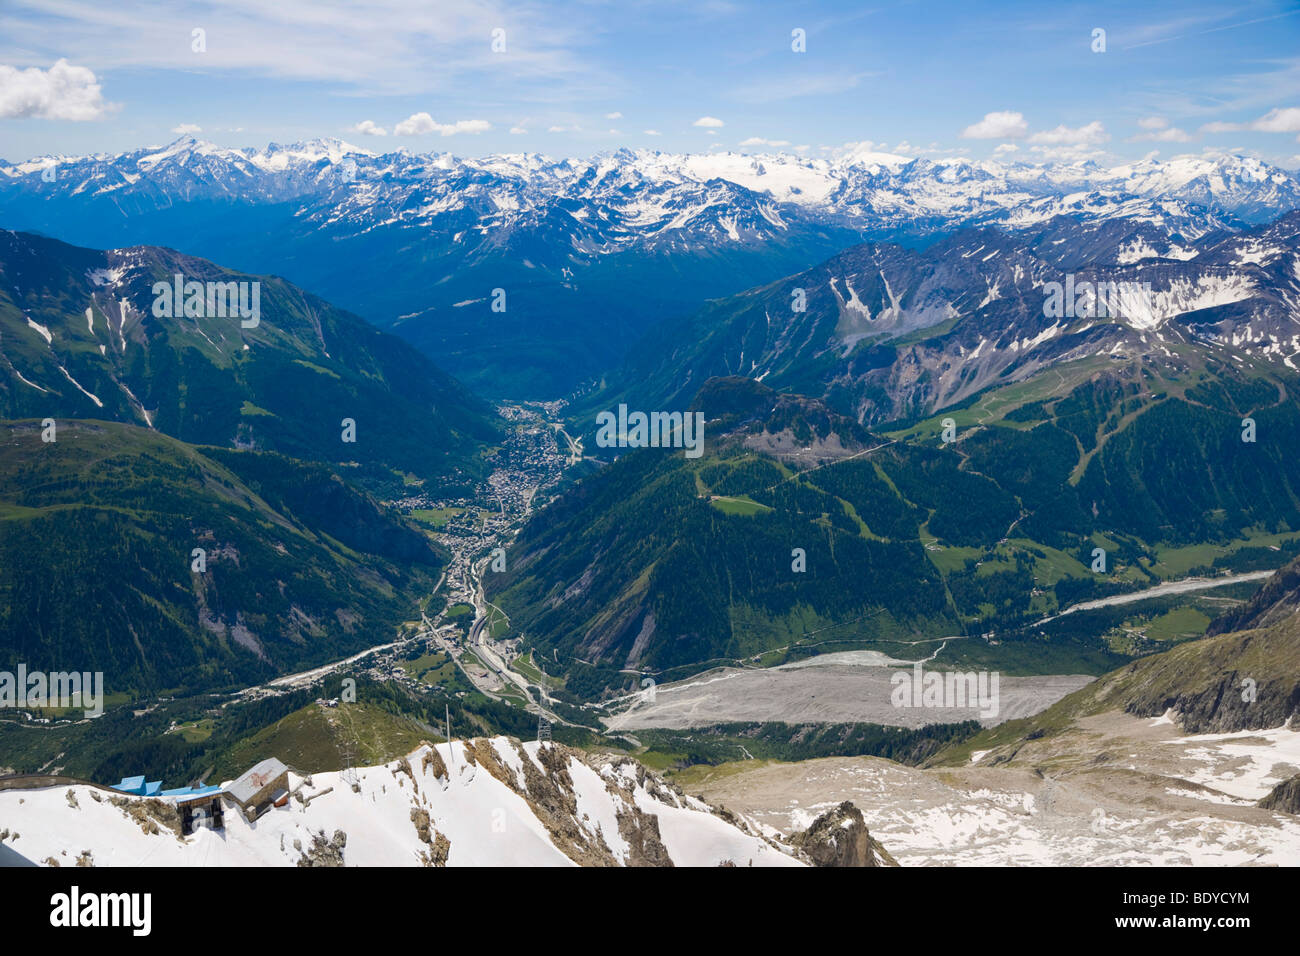 Aosta Valley, Valle d'Aosta, Val Ferret, Val Veny, Brenva Glacier from Rifugio Torino, Funivie Monte Bianco, - Stock Image